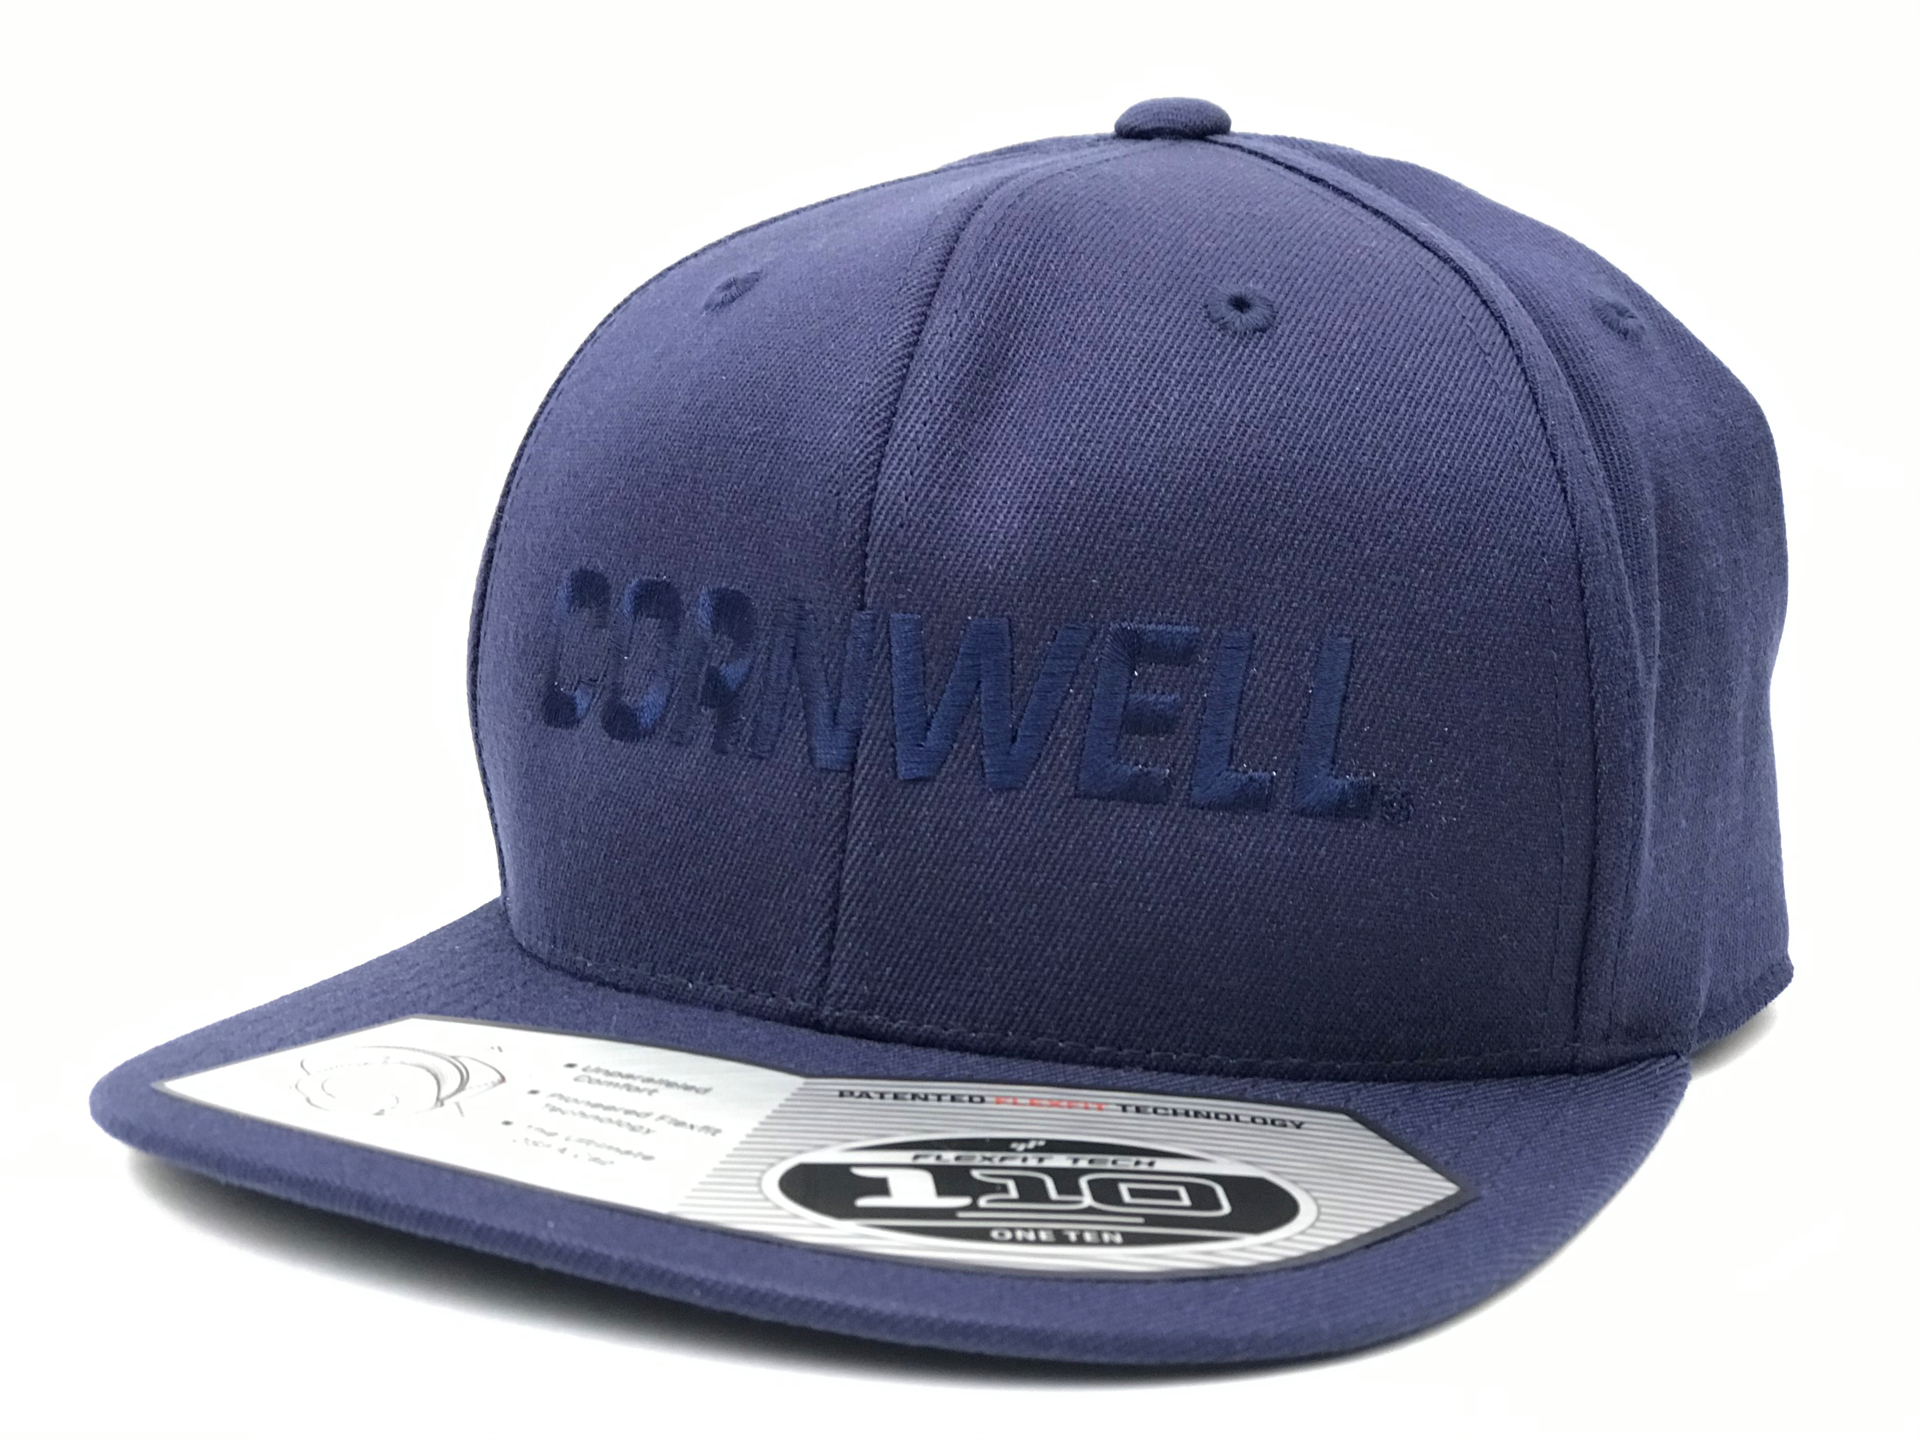 Picture of Flexfit Flatbill Monochrome Hat (CGNVH)